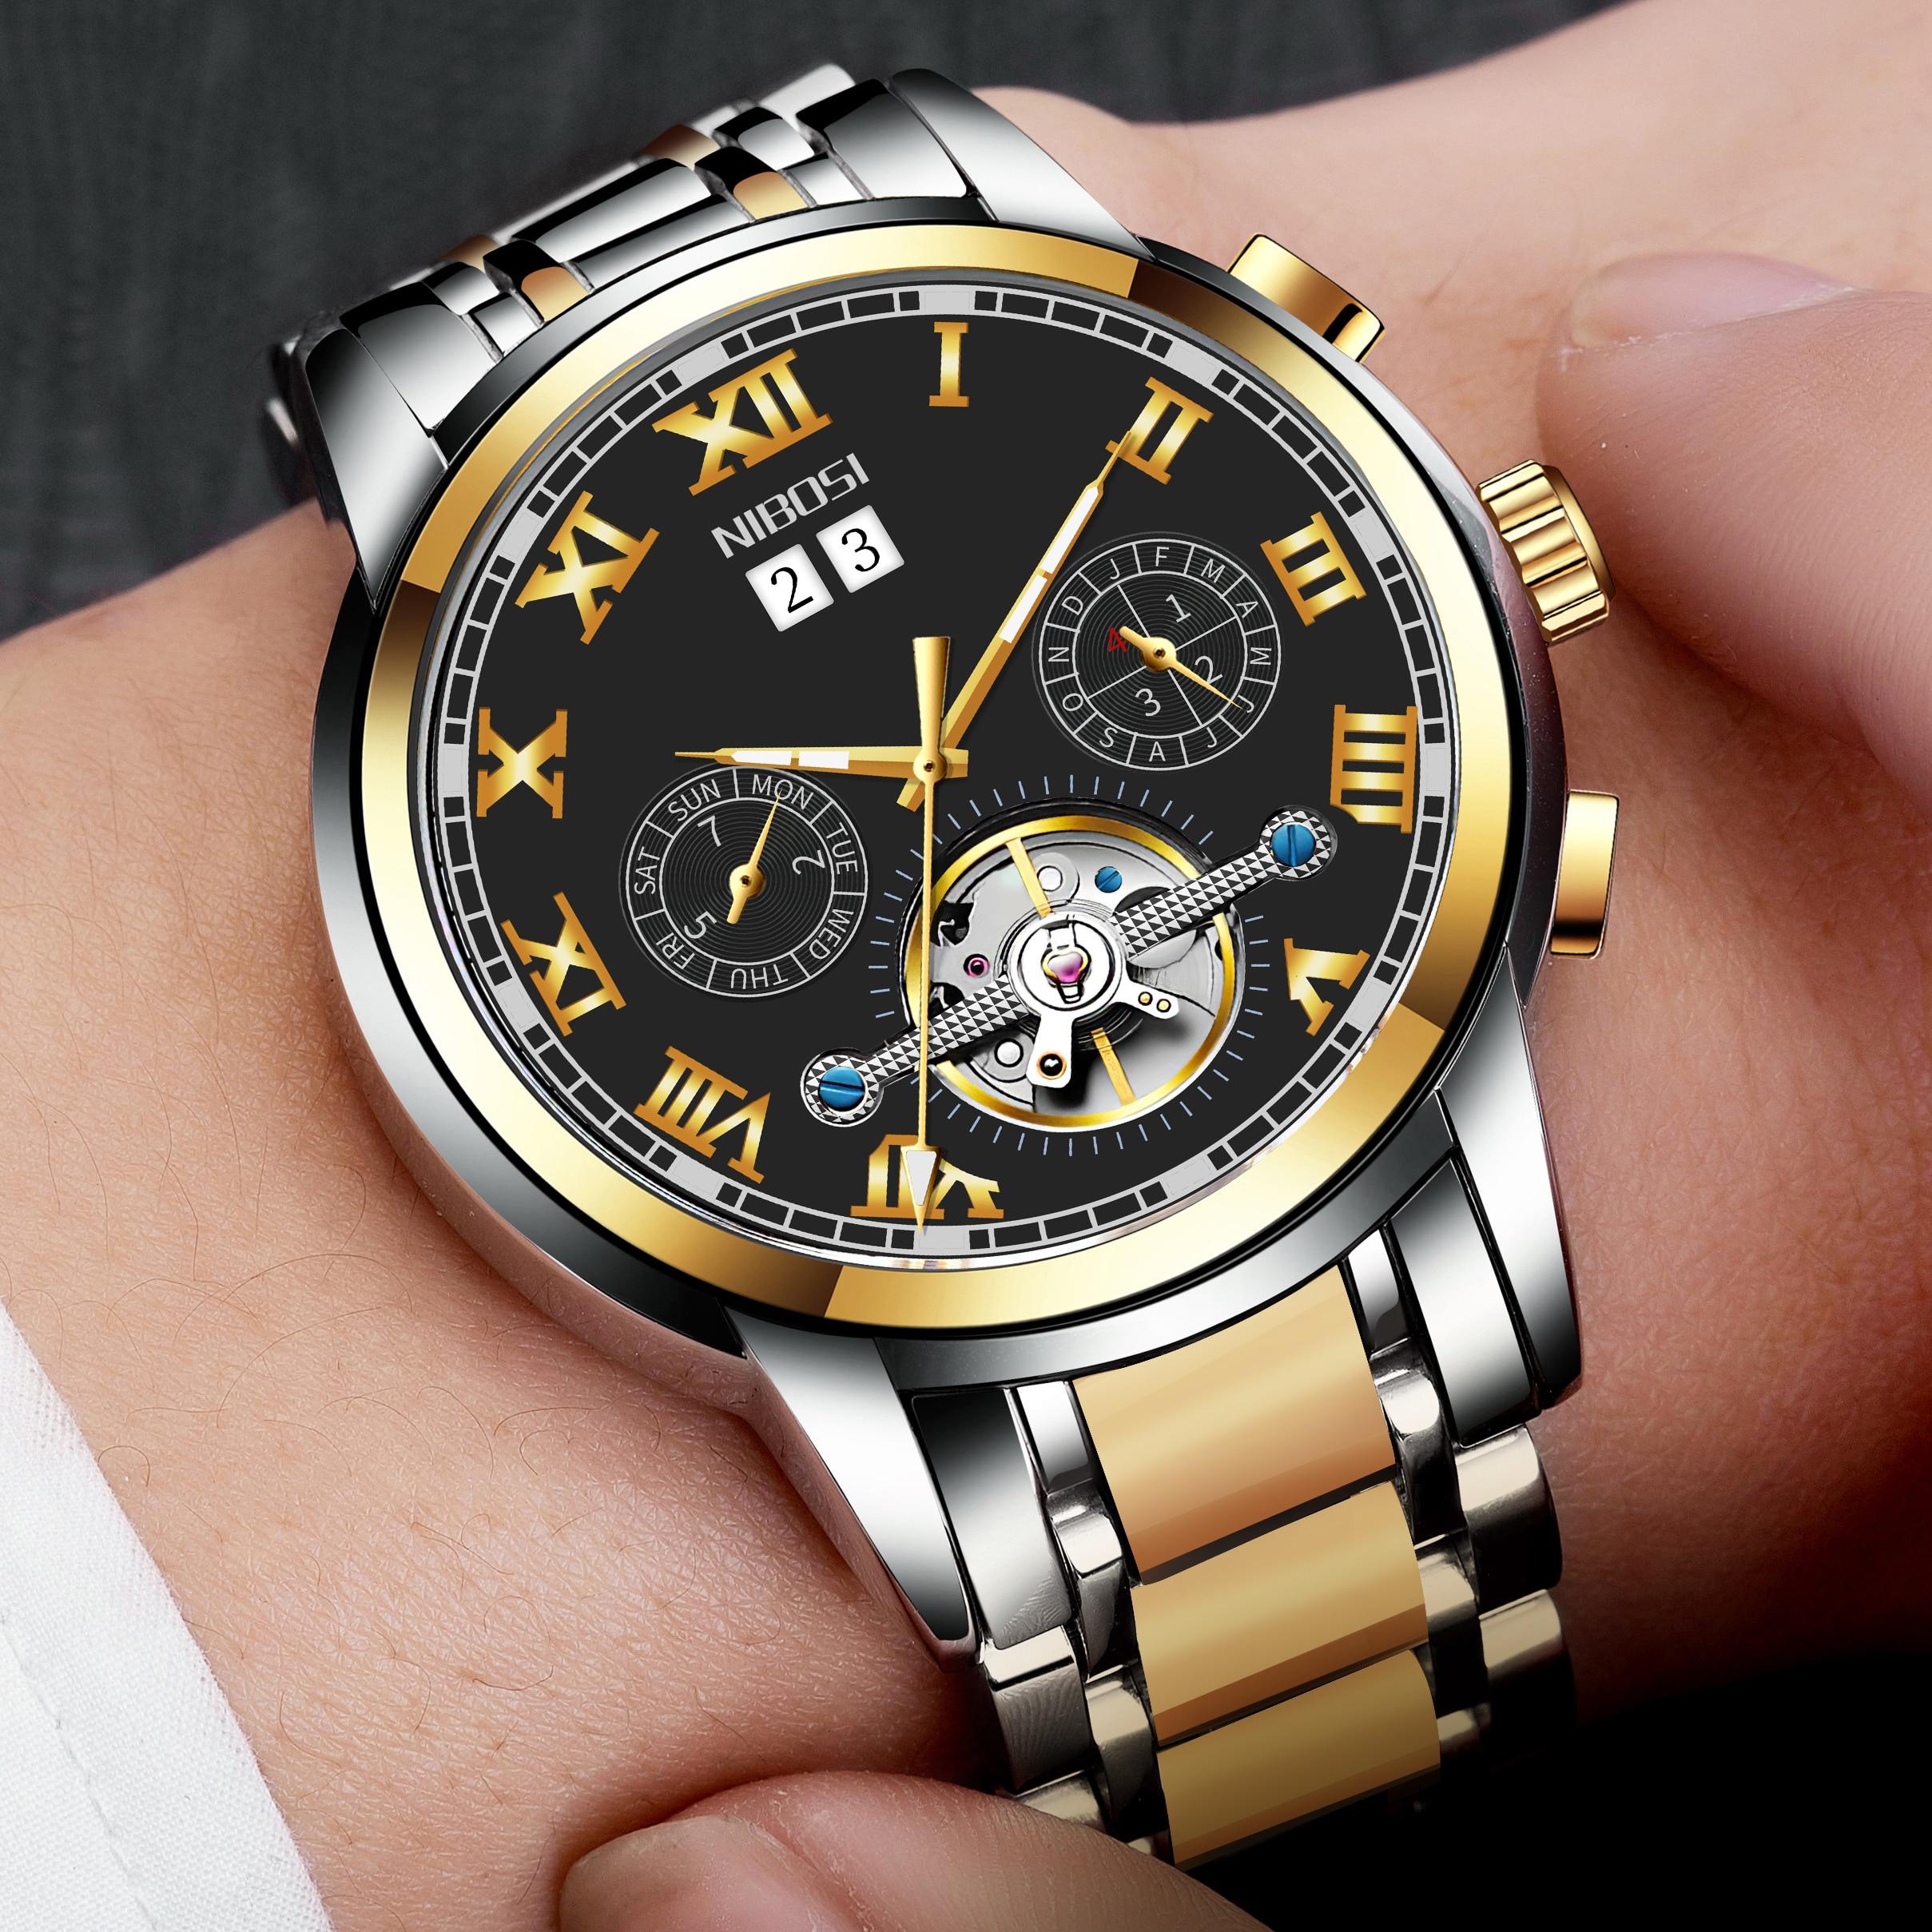 NIBOSI Mechanic Watch Top Brand Luxury Mens Watches Automatic Luxury Watch Men Sport Wristwatch mens reloj hombre Tourbillon 2